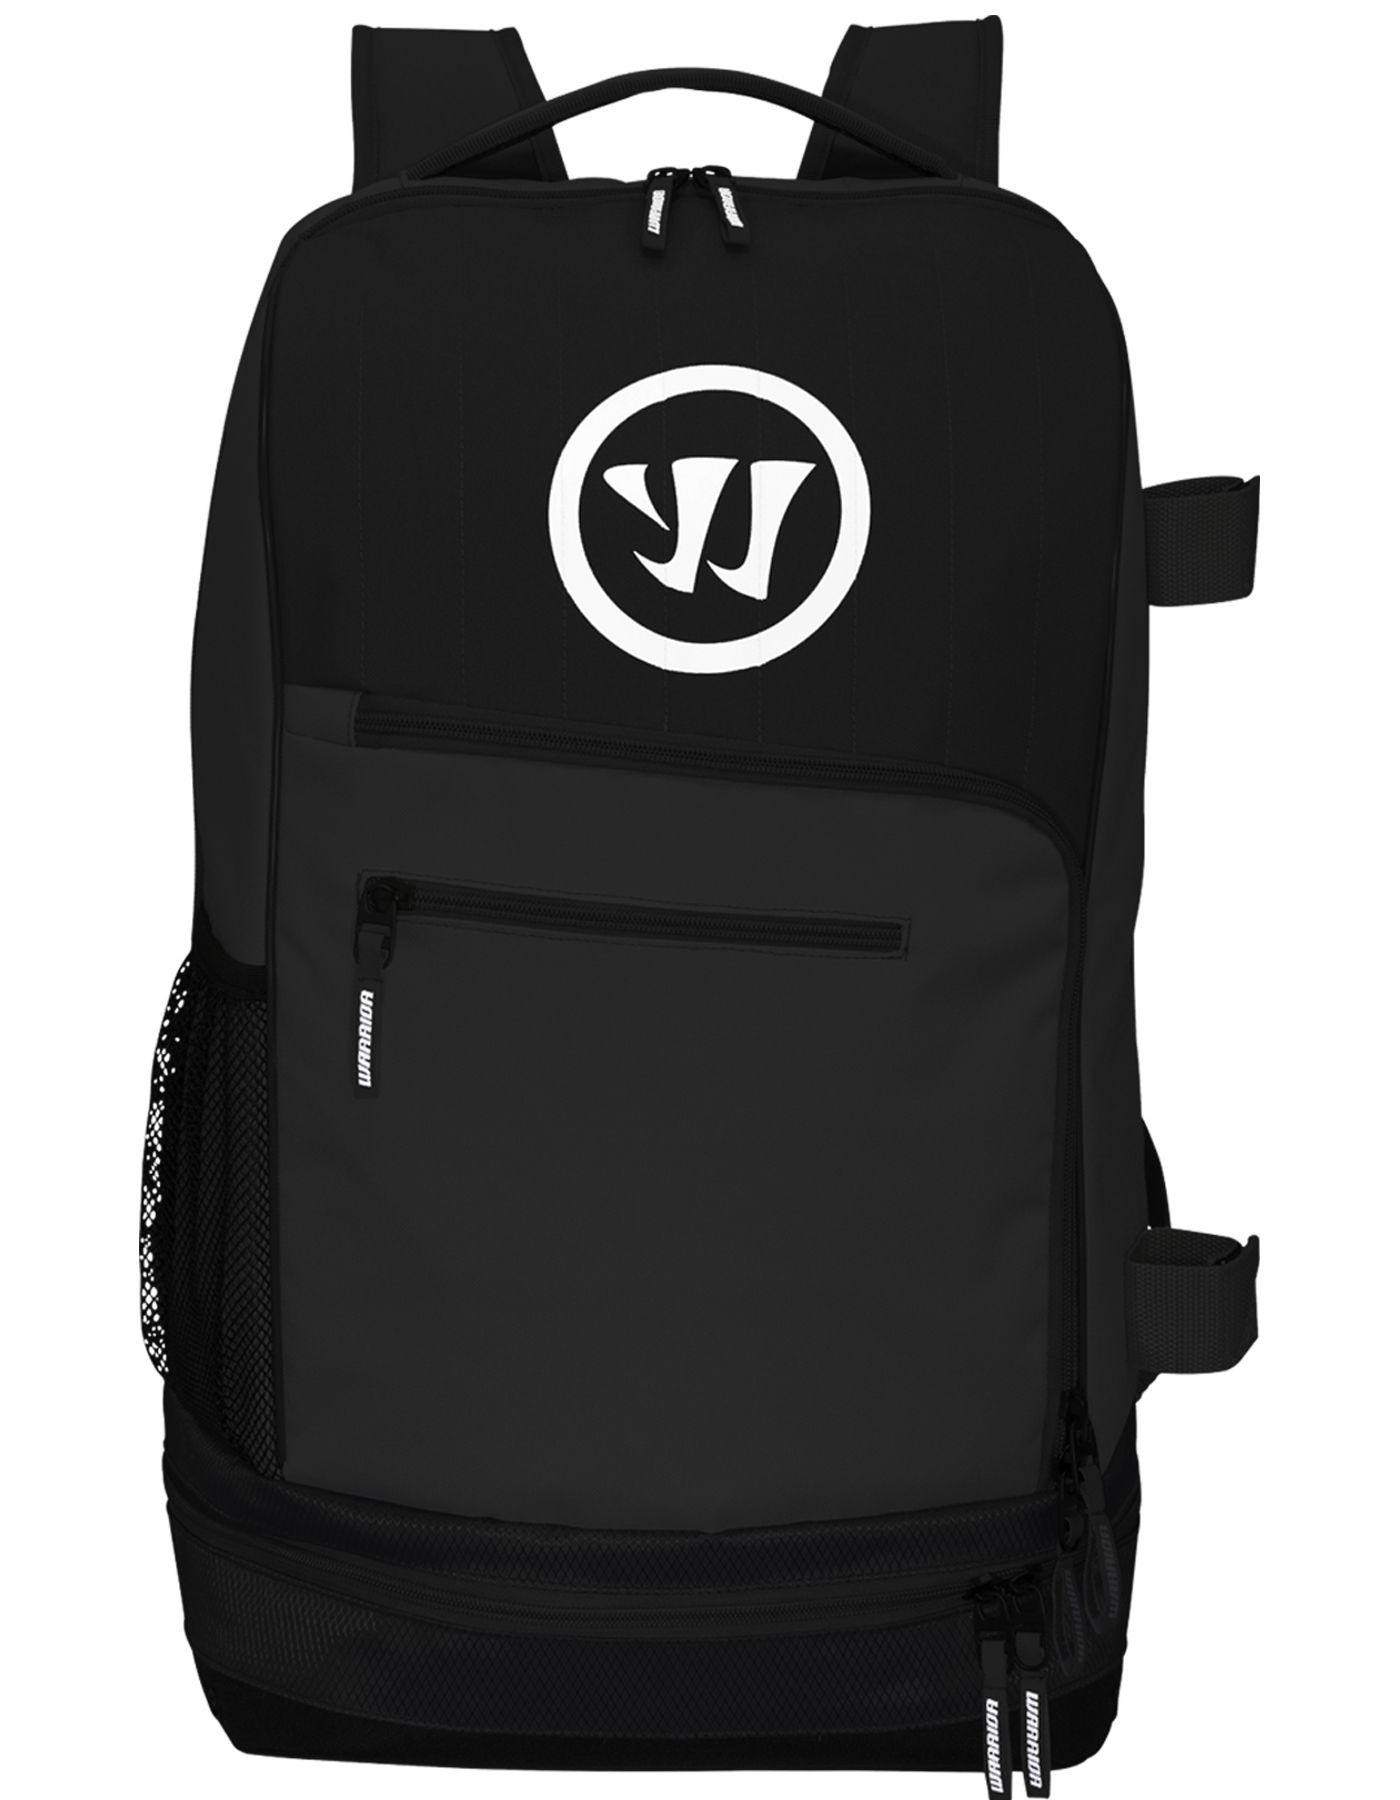 Warrior Jet Pack Max Lacrosse Backpack